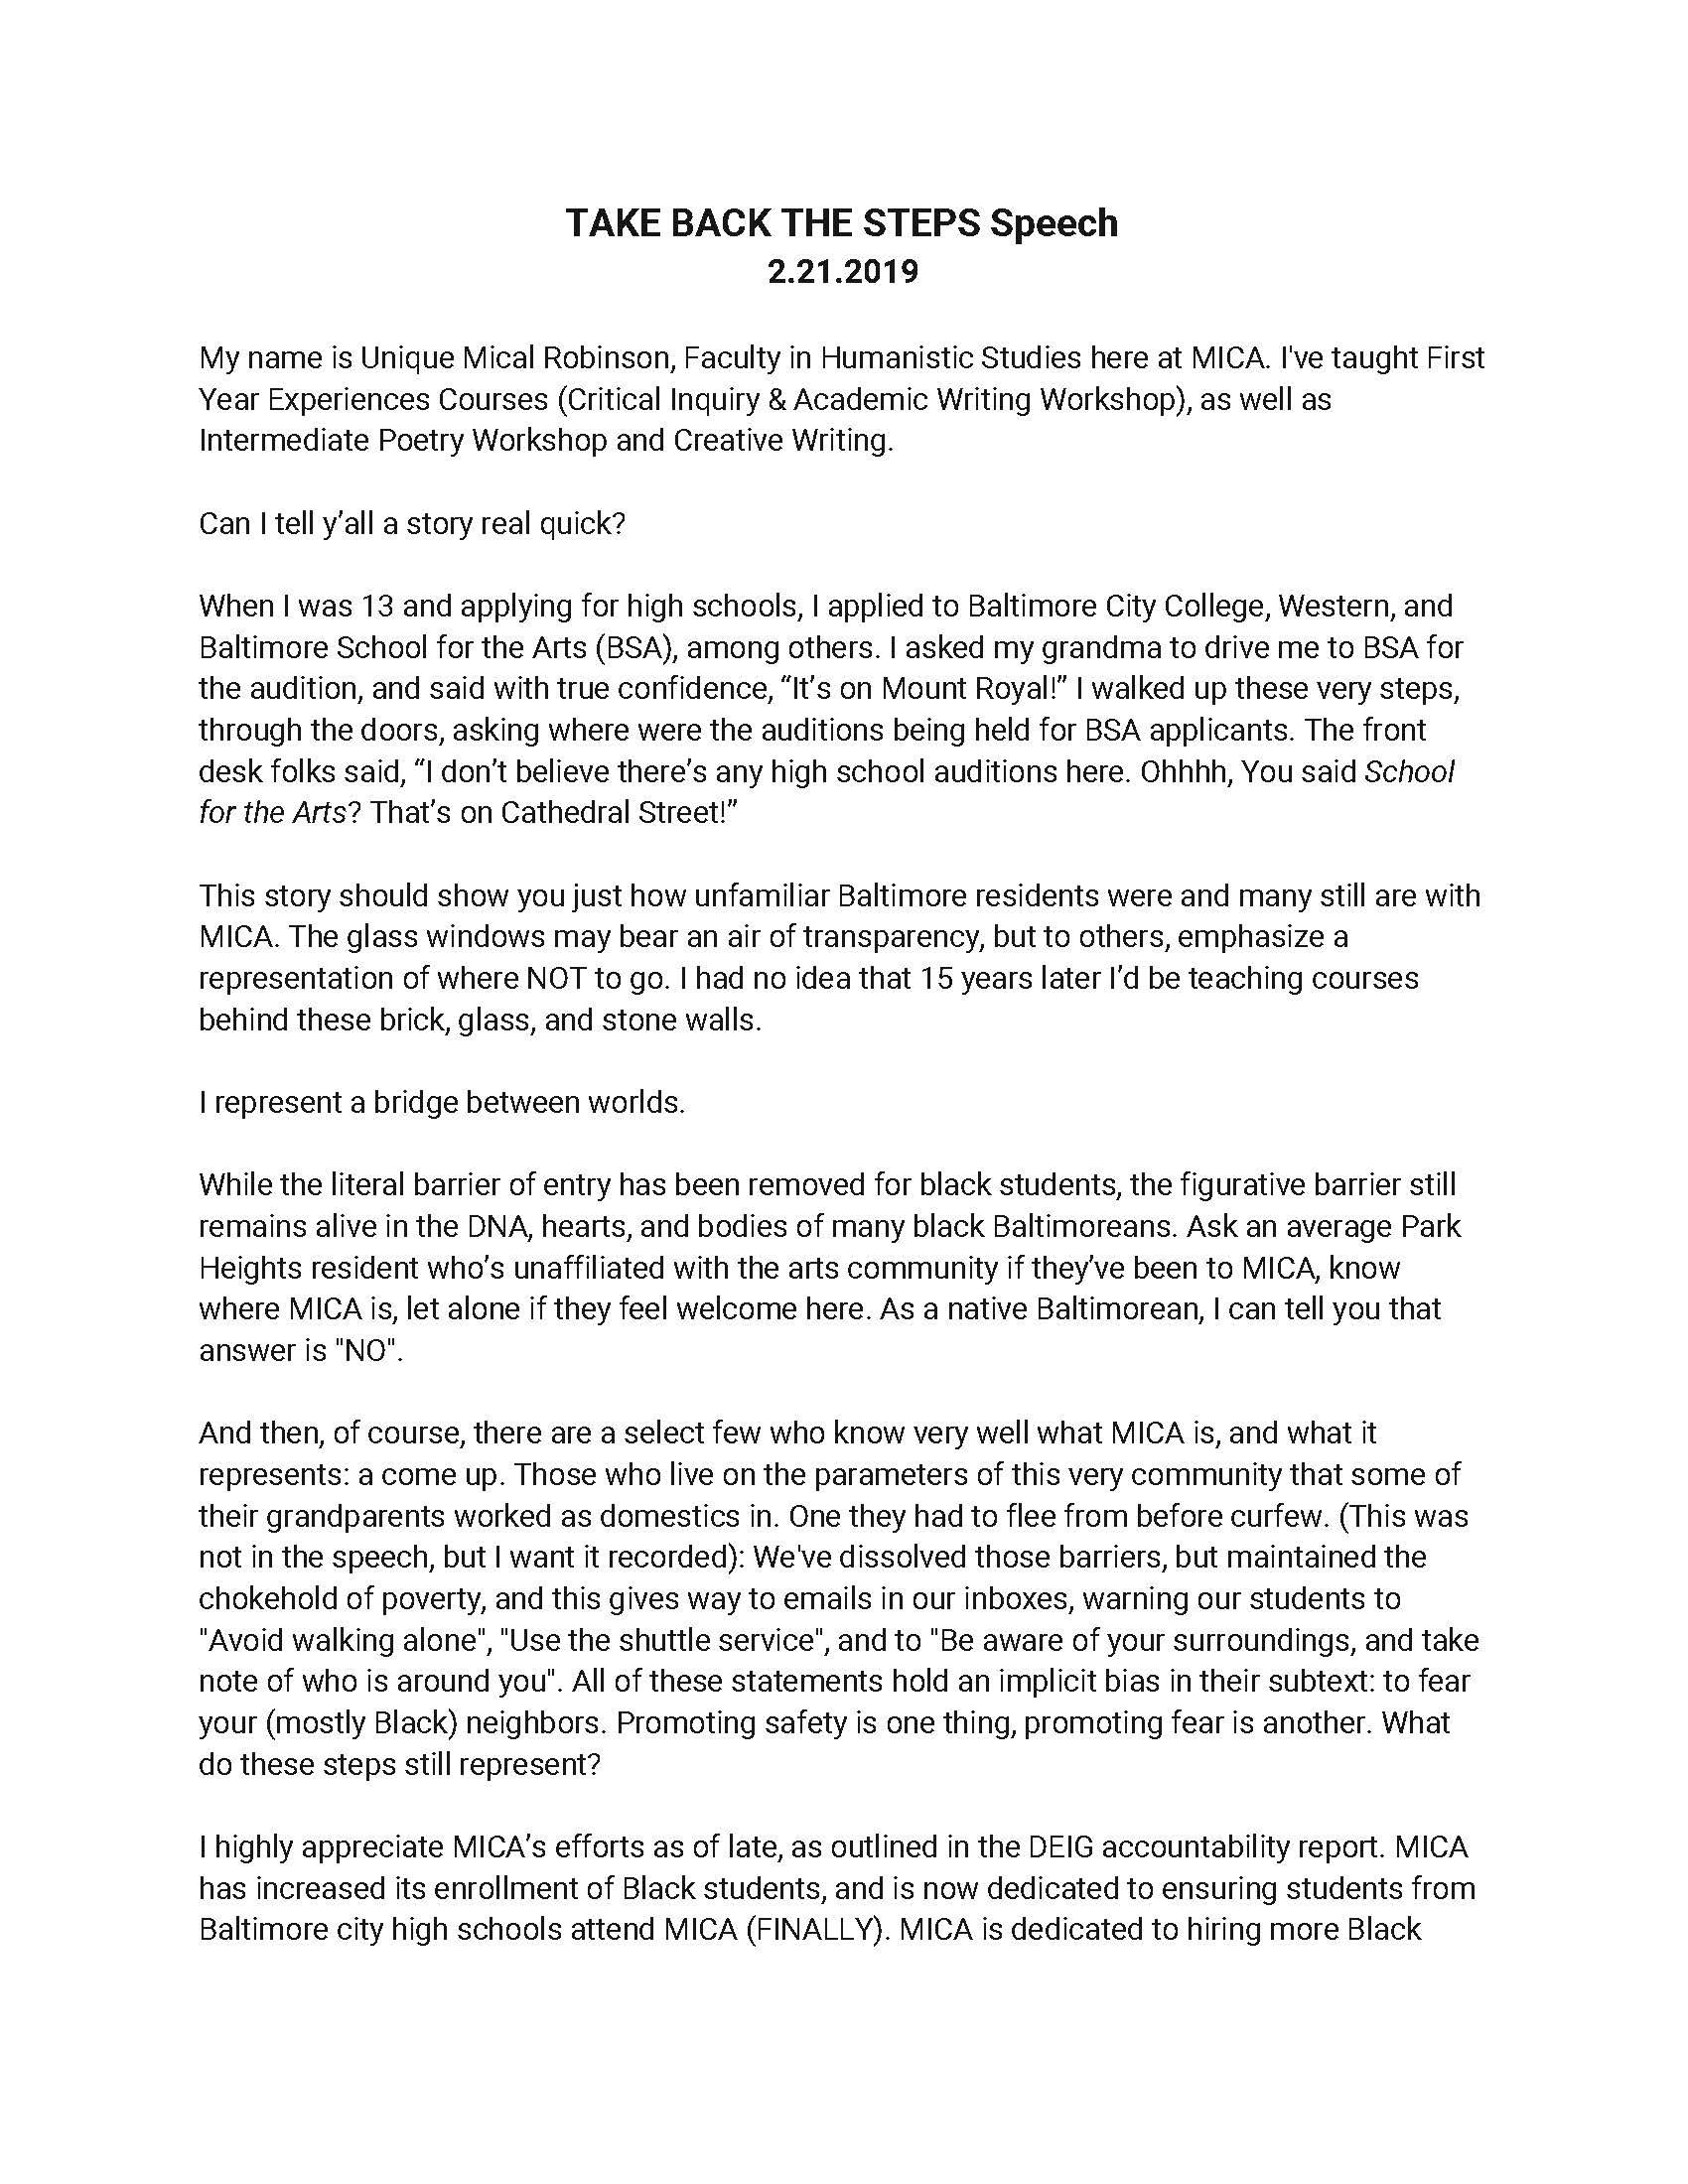 Unique Robinson's Speech, Side One